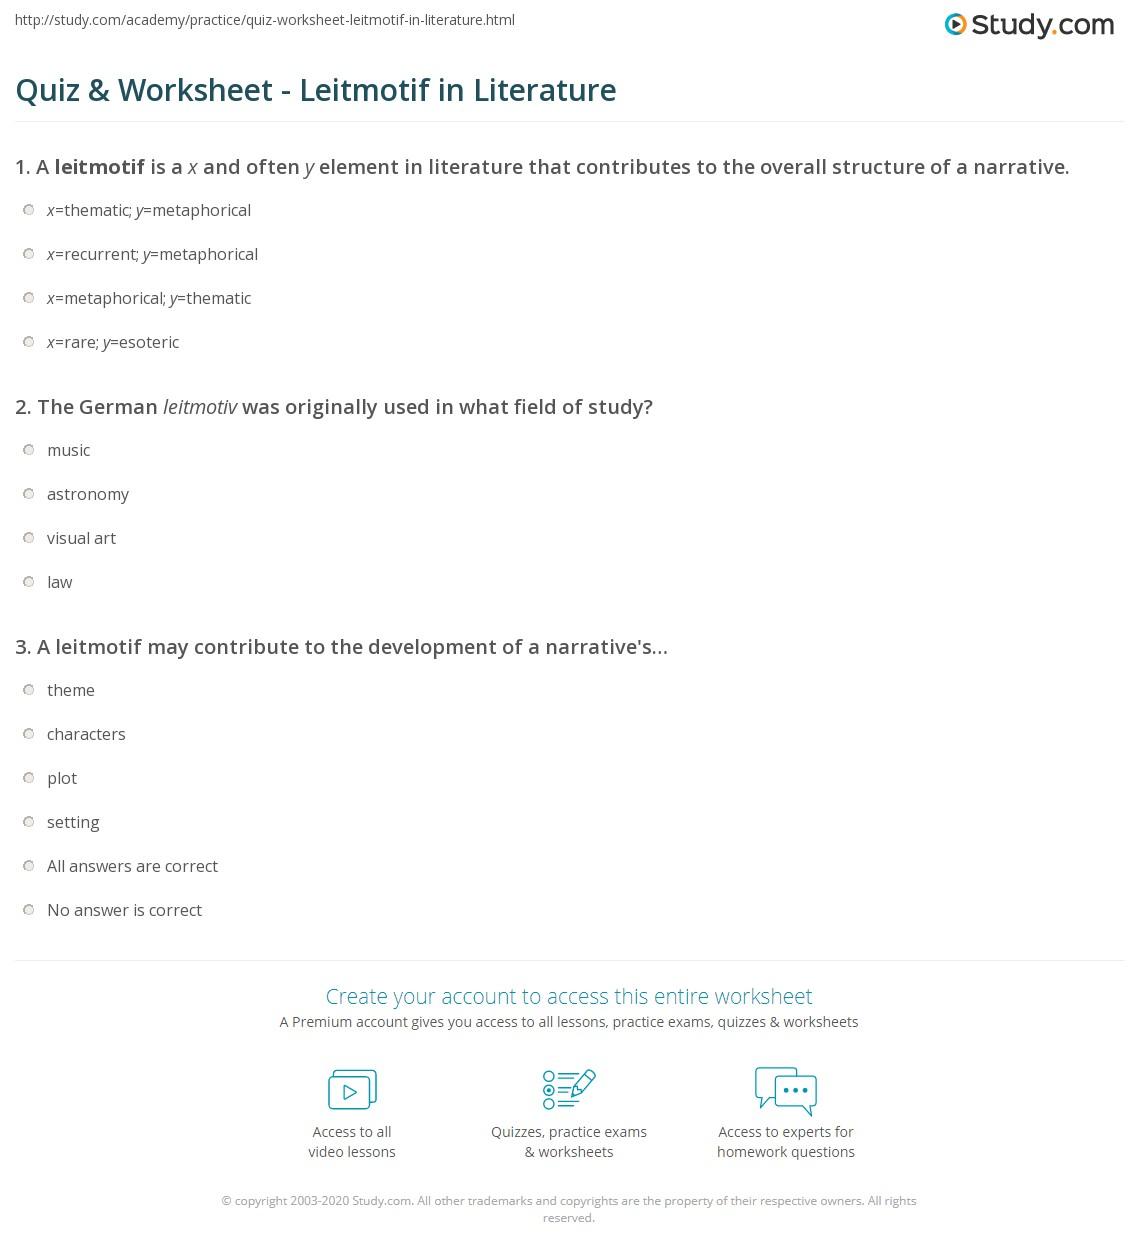 quiz & worksheet - leitmotif in literature | study